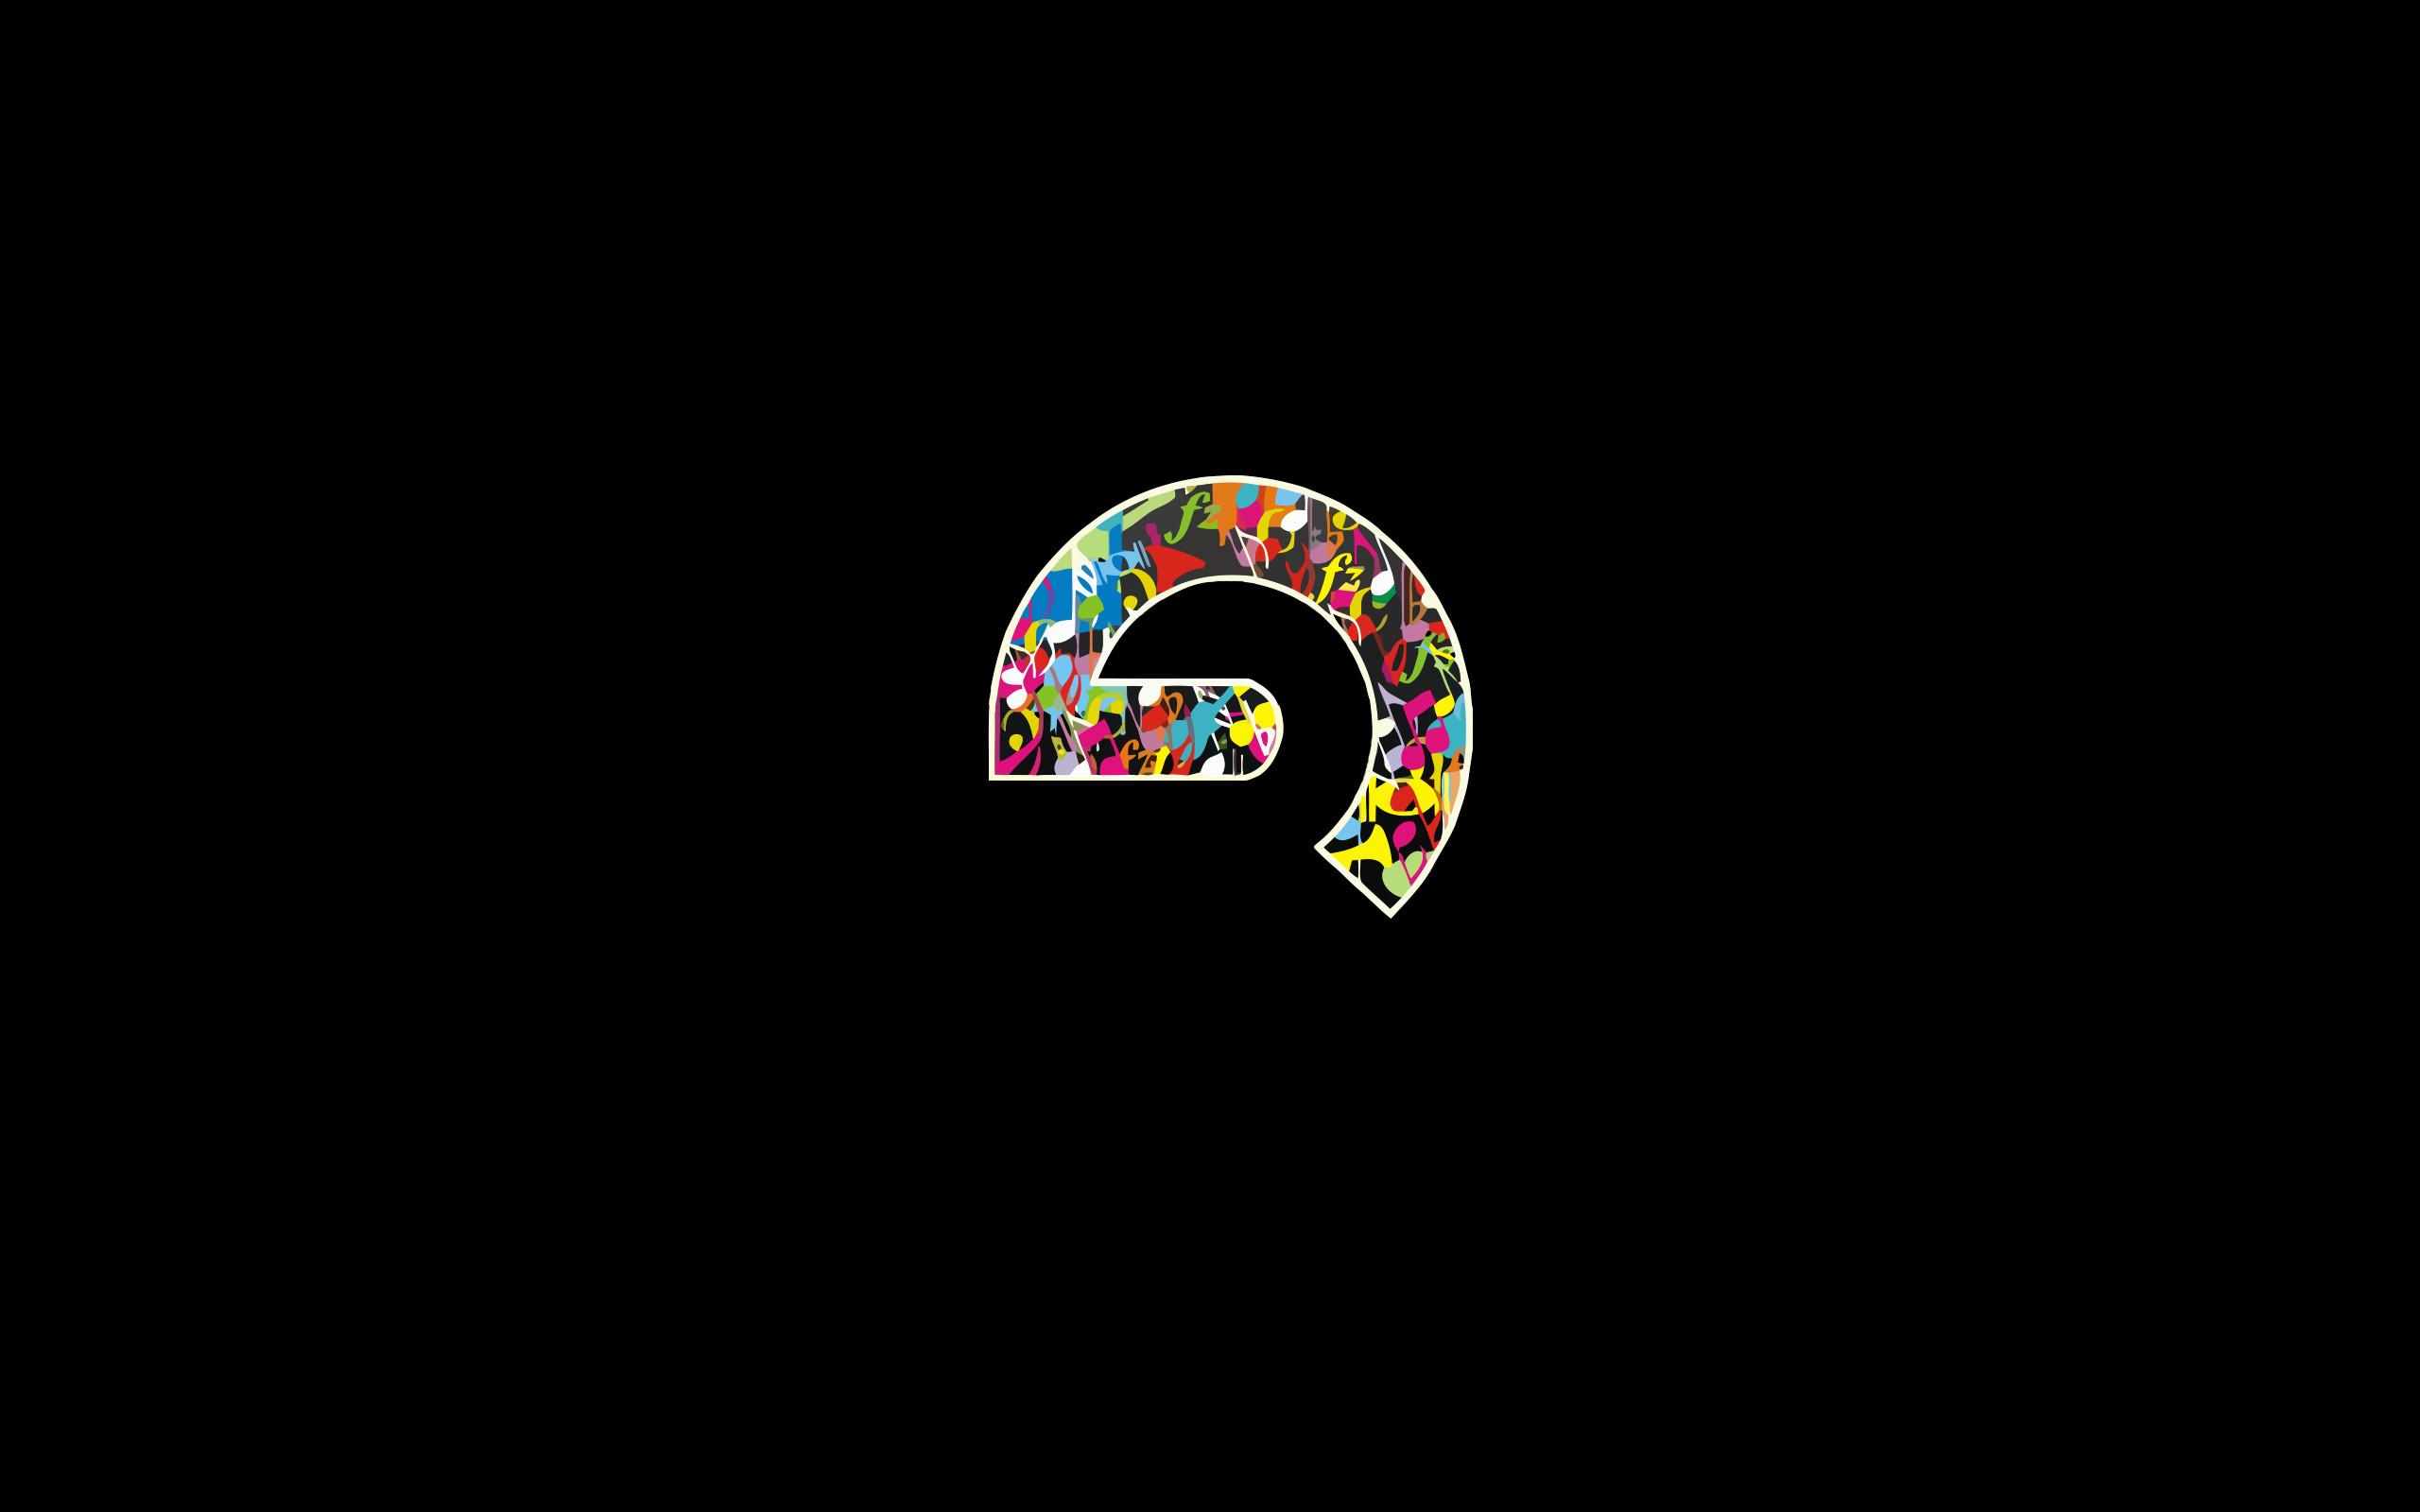 Ableton Live Logo Ableton-logo.png